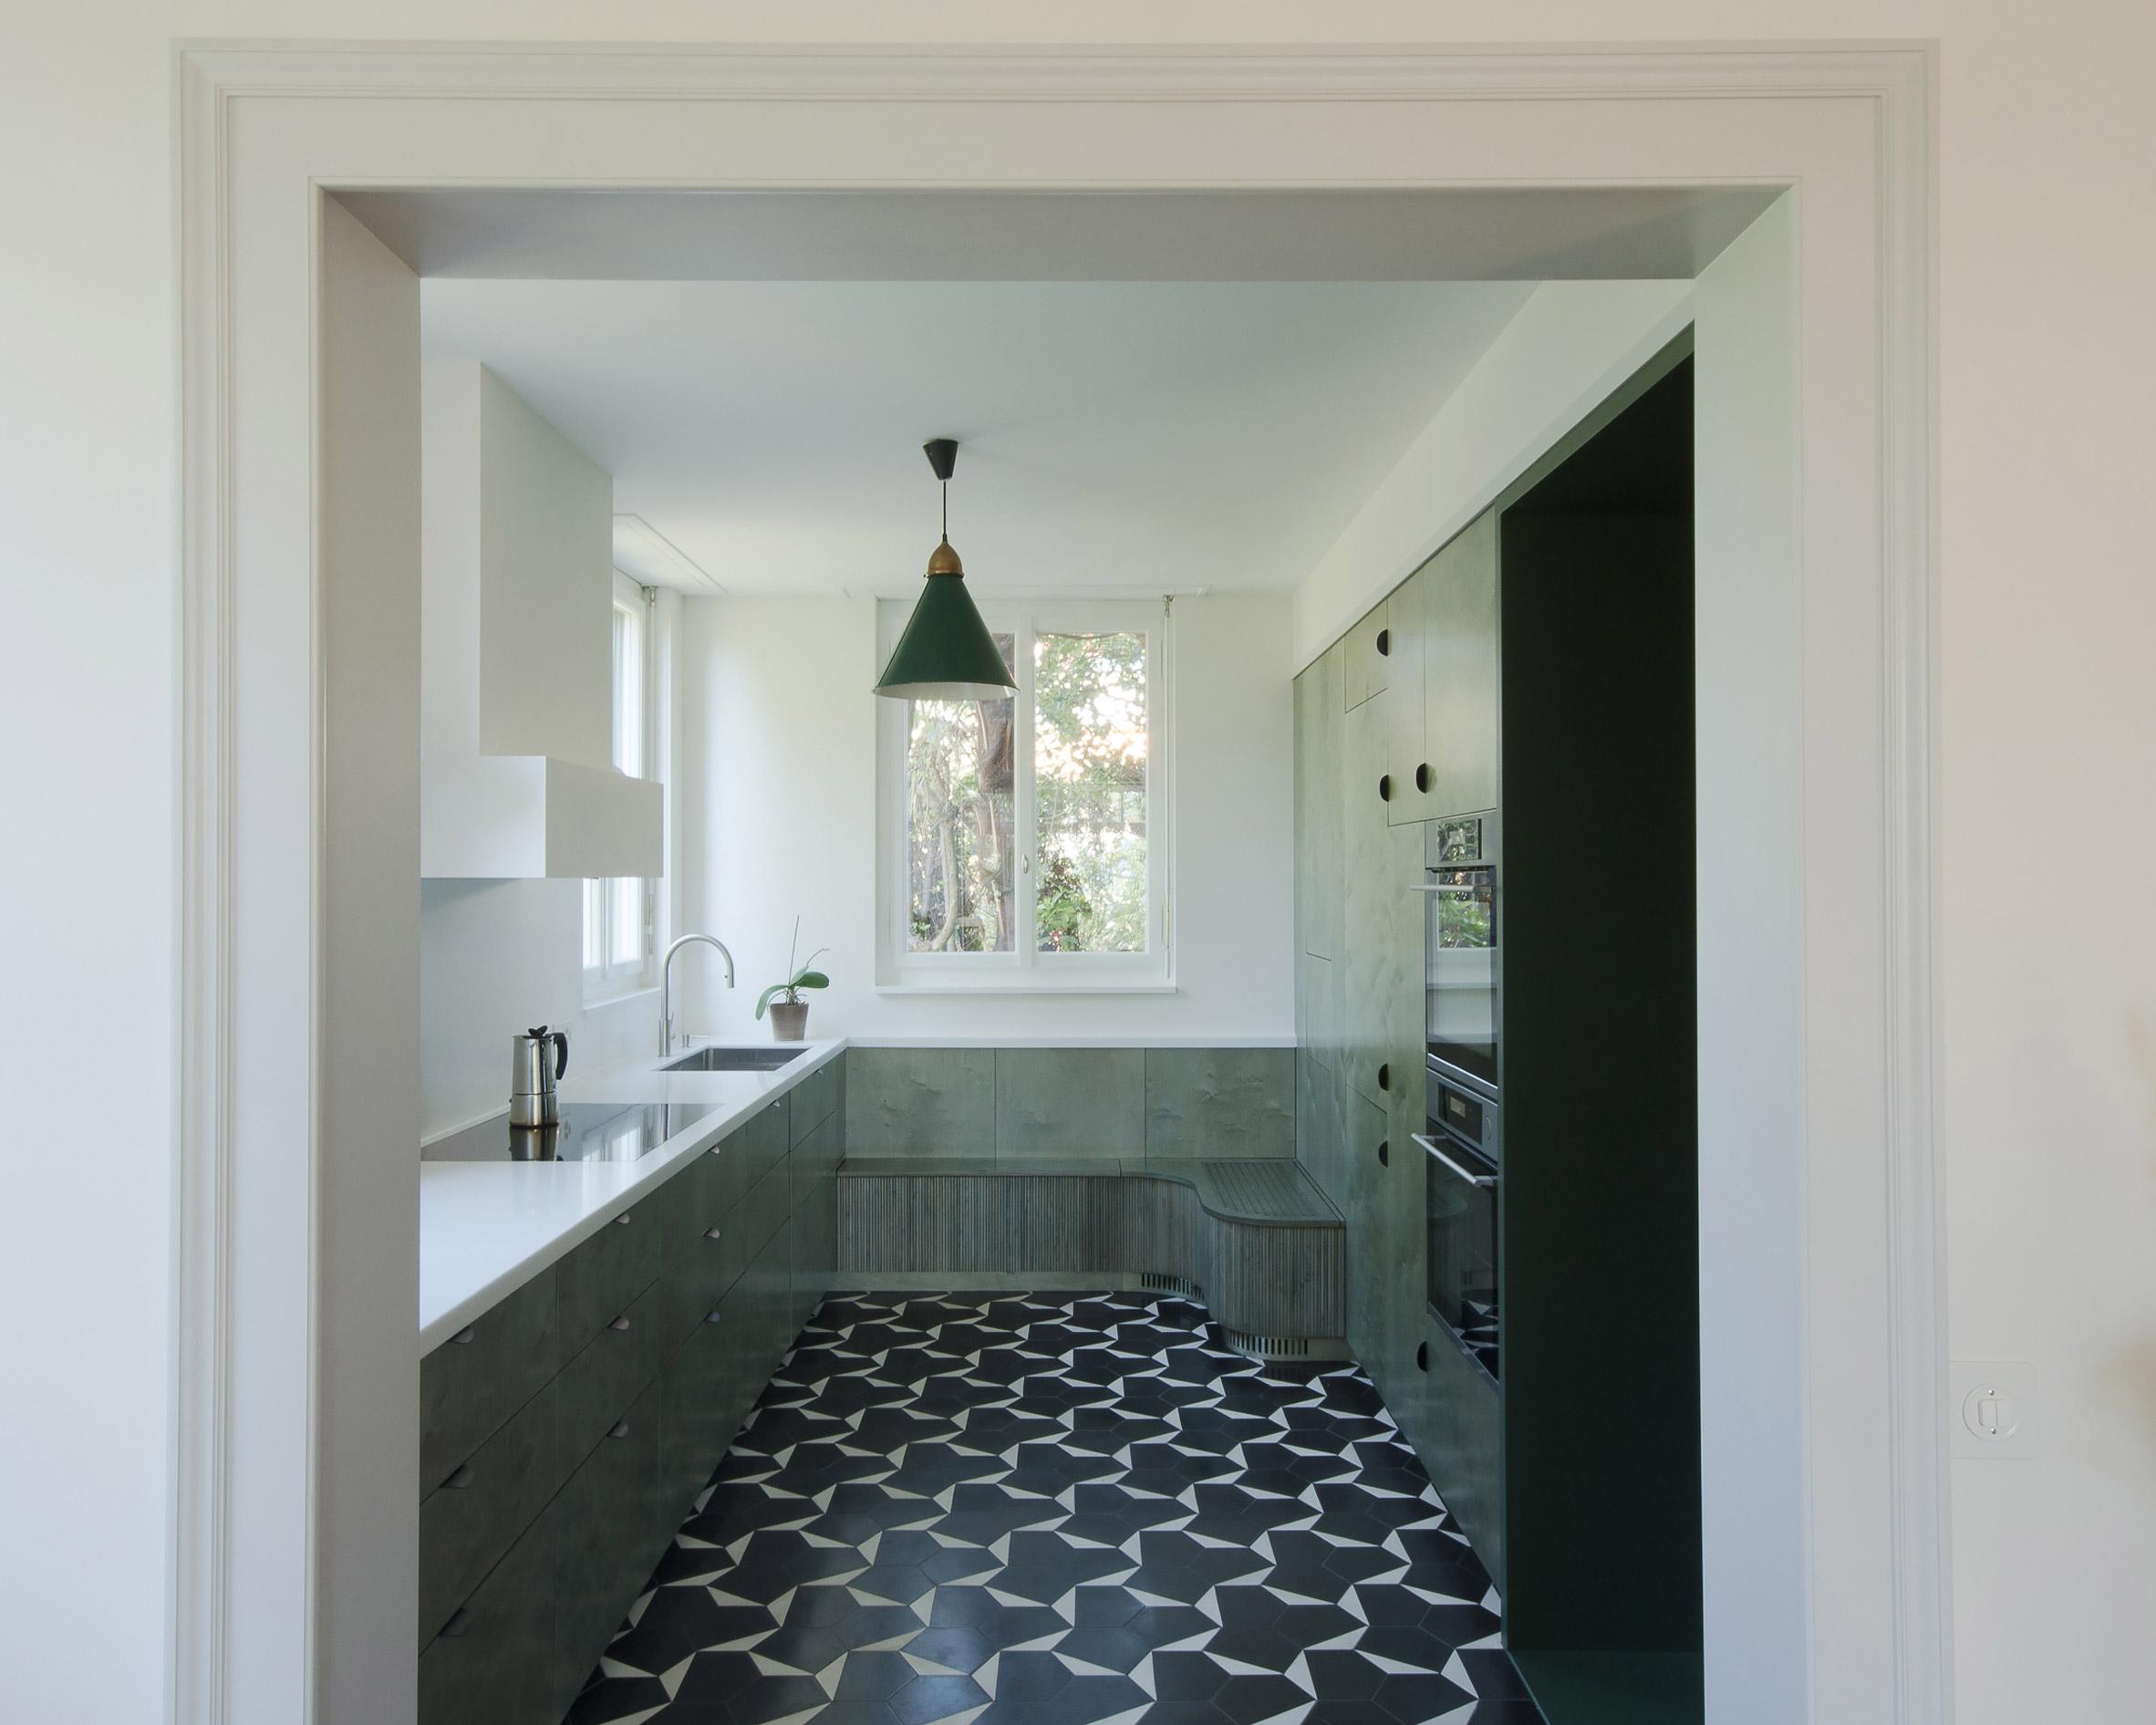 Bureau brisson architectes refresh hilltop villa in lausanne